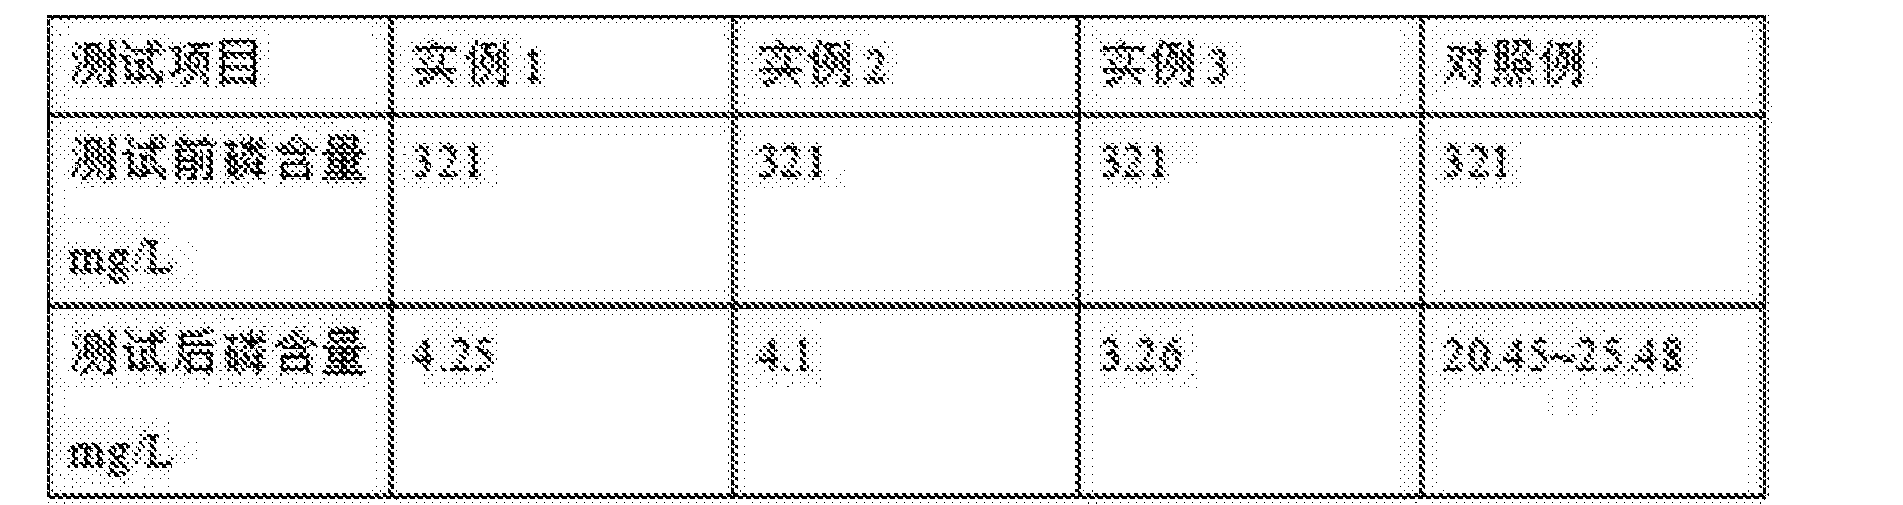 Figure CN107473393AD00061